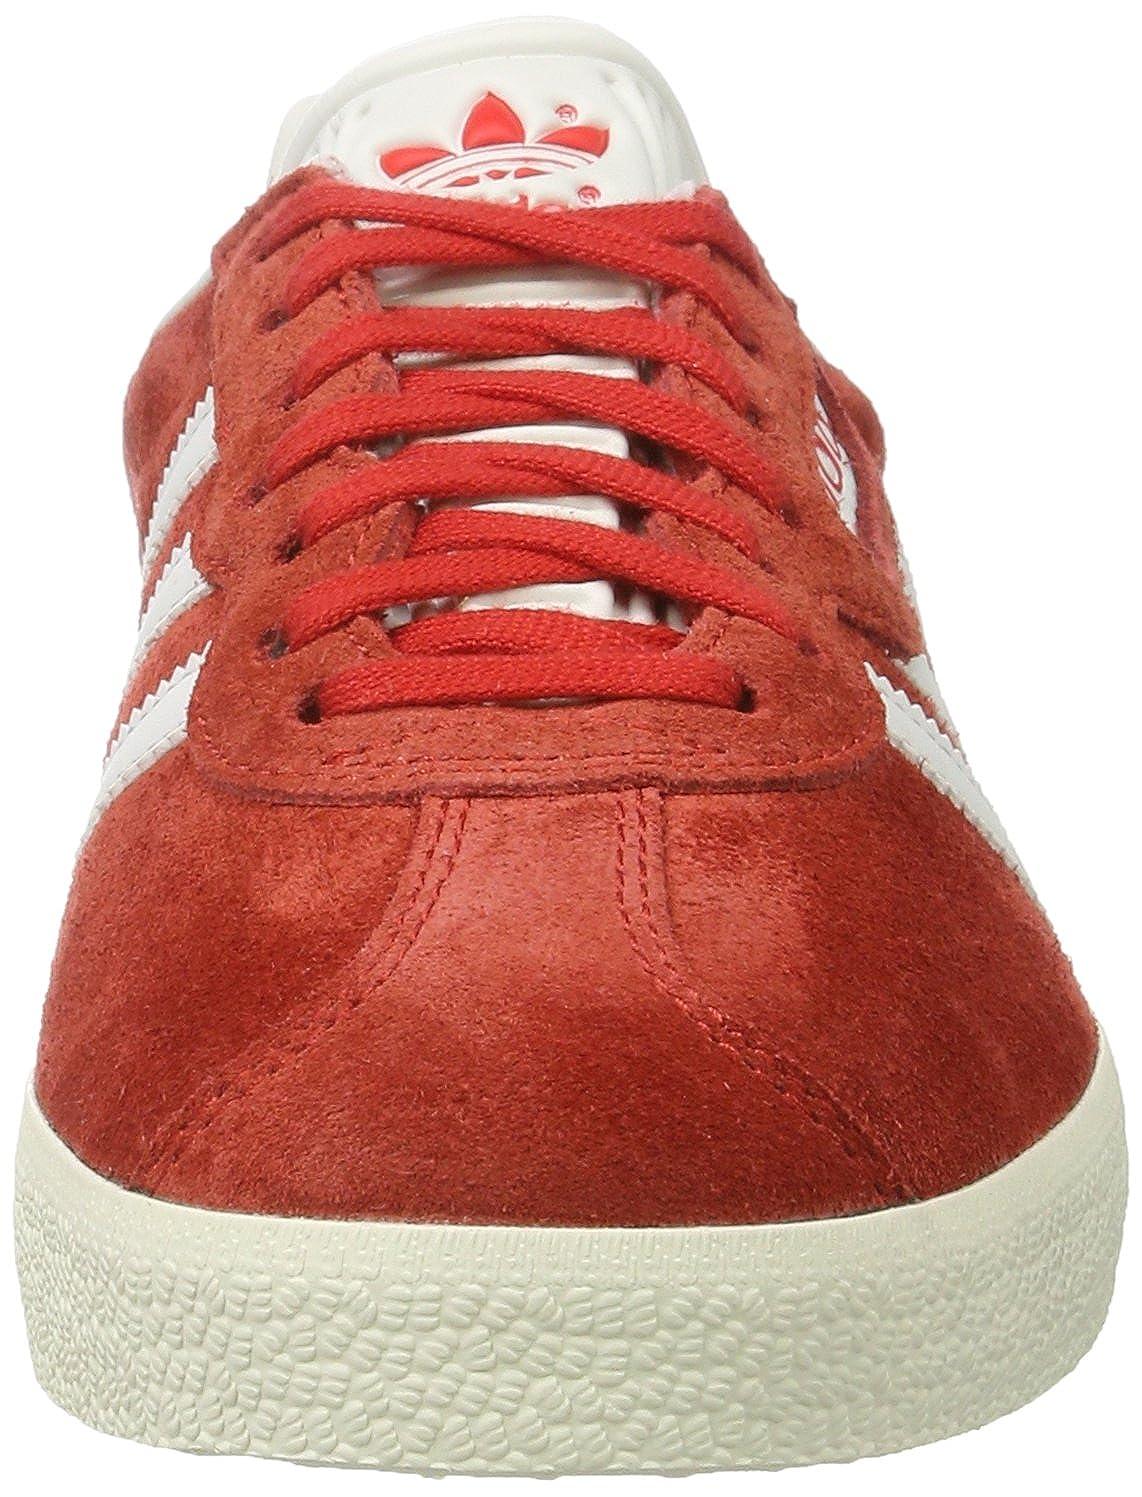 info for 119d8 6fab4 adidas Gazelle, Basket Mode Homme Amazon.fr Chaussures et Sa